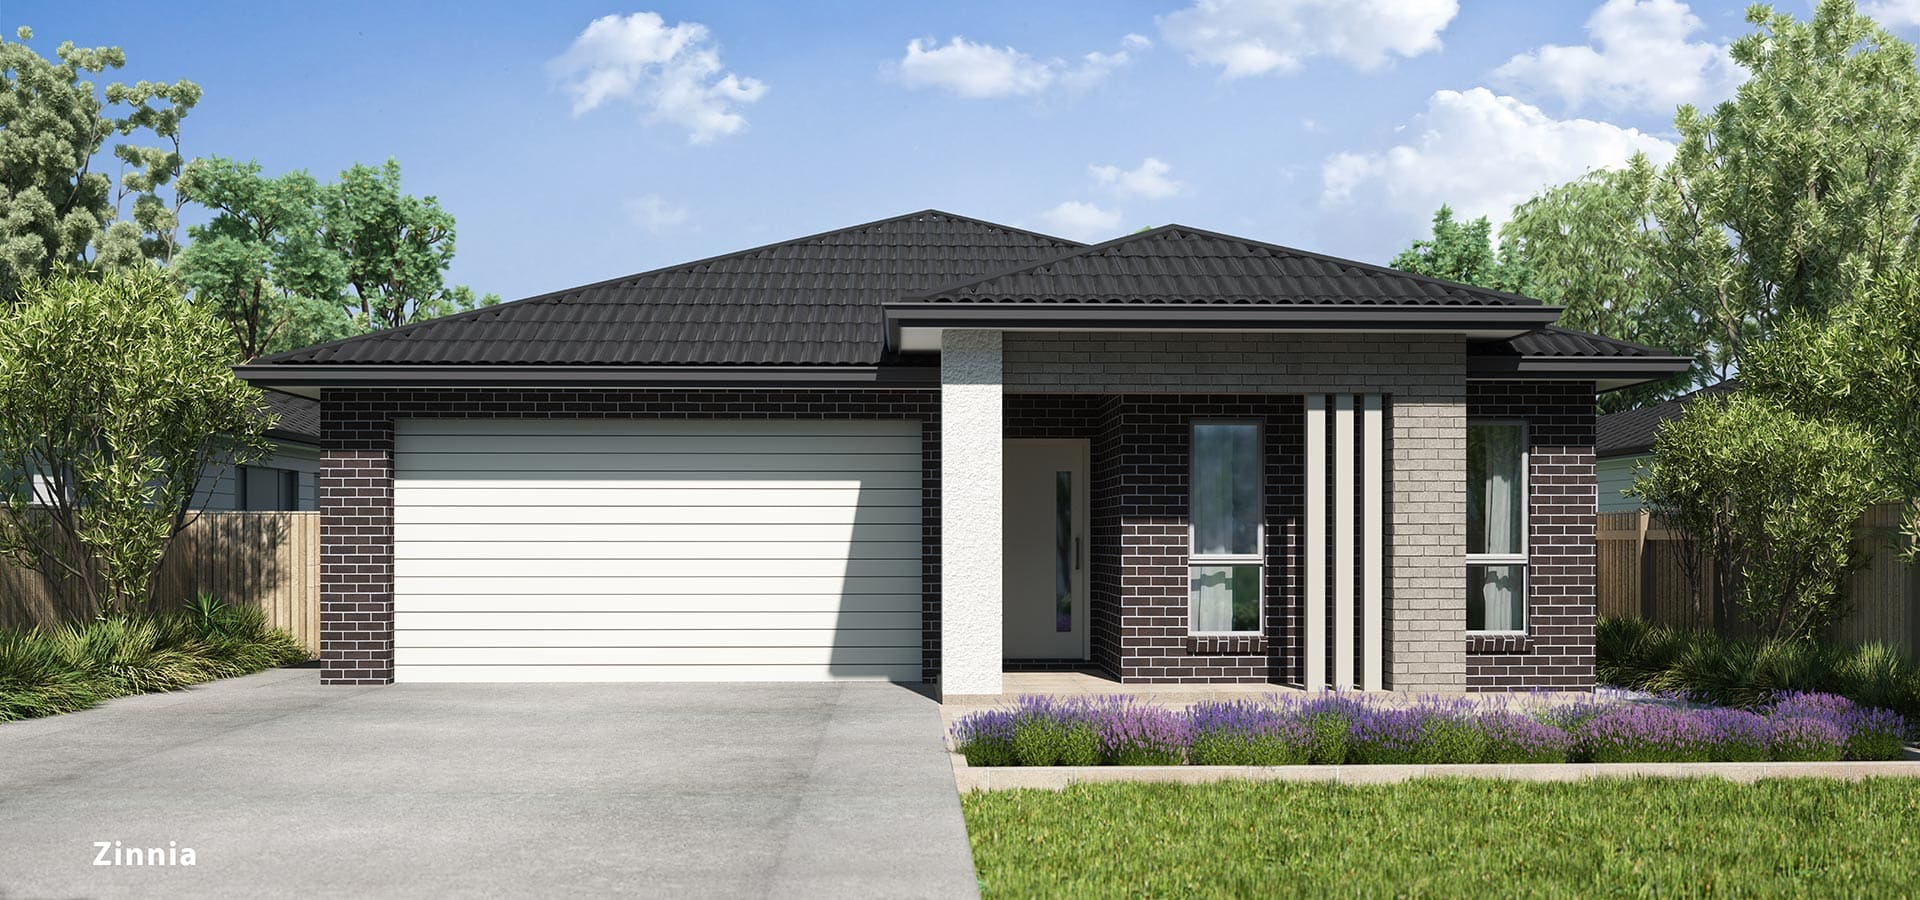 Zinnia-12-13-Y-Single-House-Design